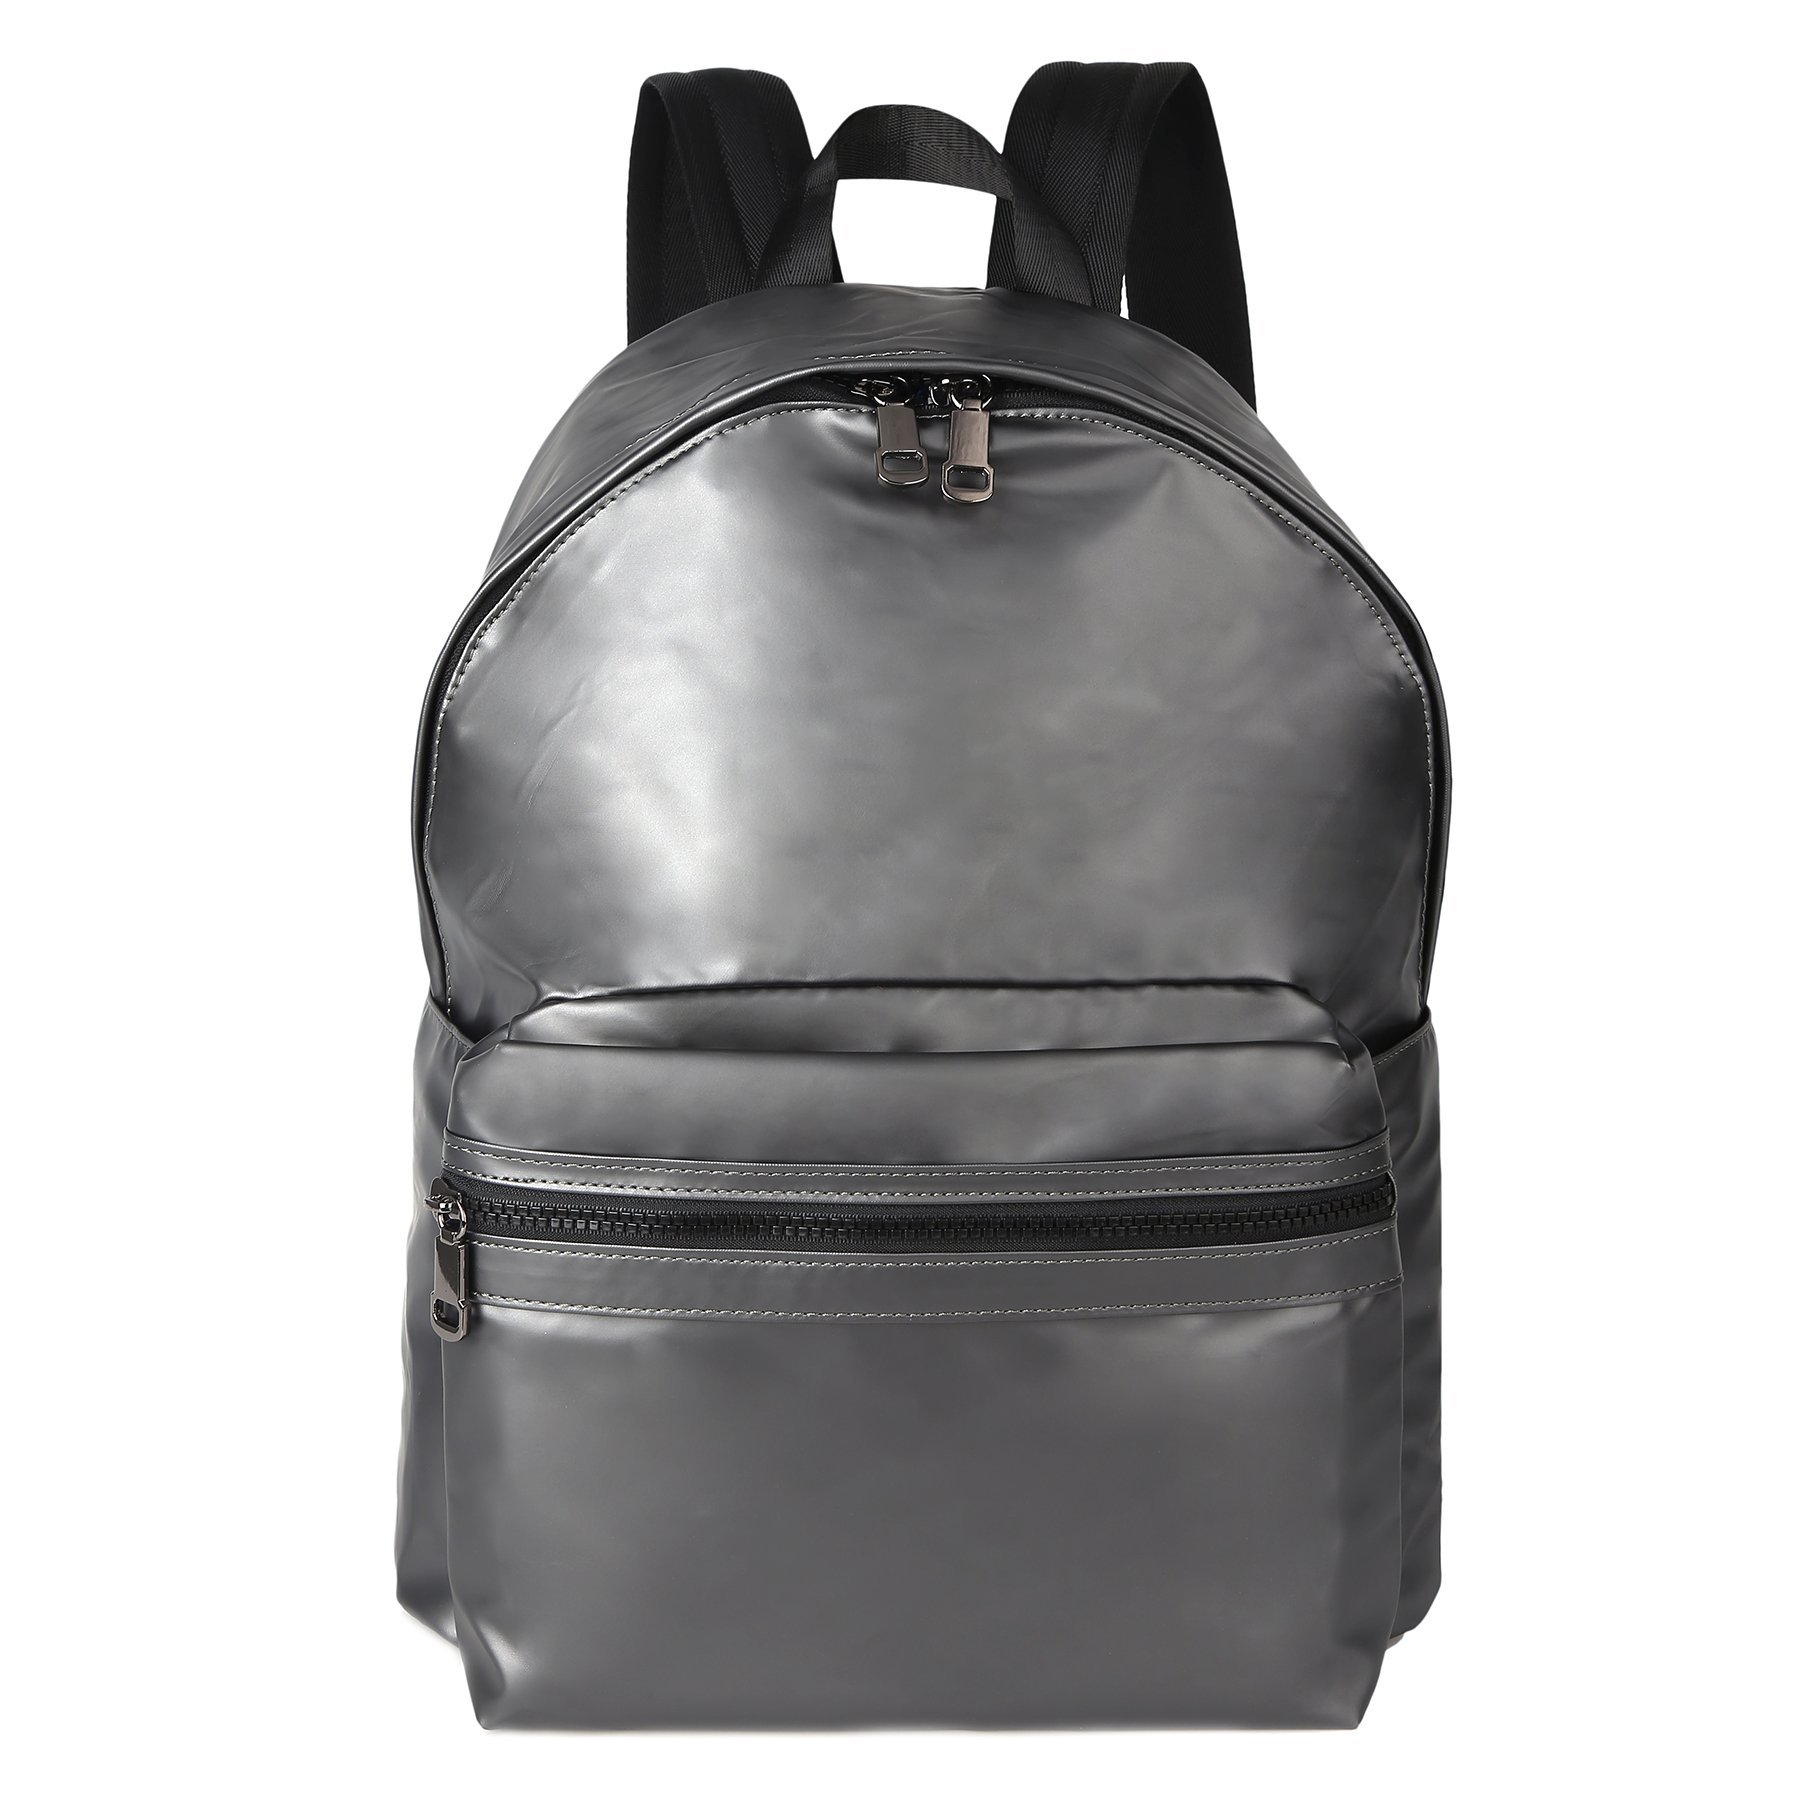 ZORFIN Fashion Nylon Backpack for Women&Men Rucksack Purse School Bags for Girls Waterproof Book Bag by ZORFIN (Image #2)